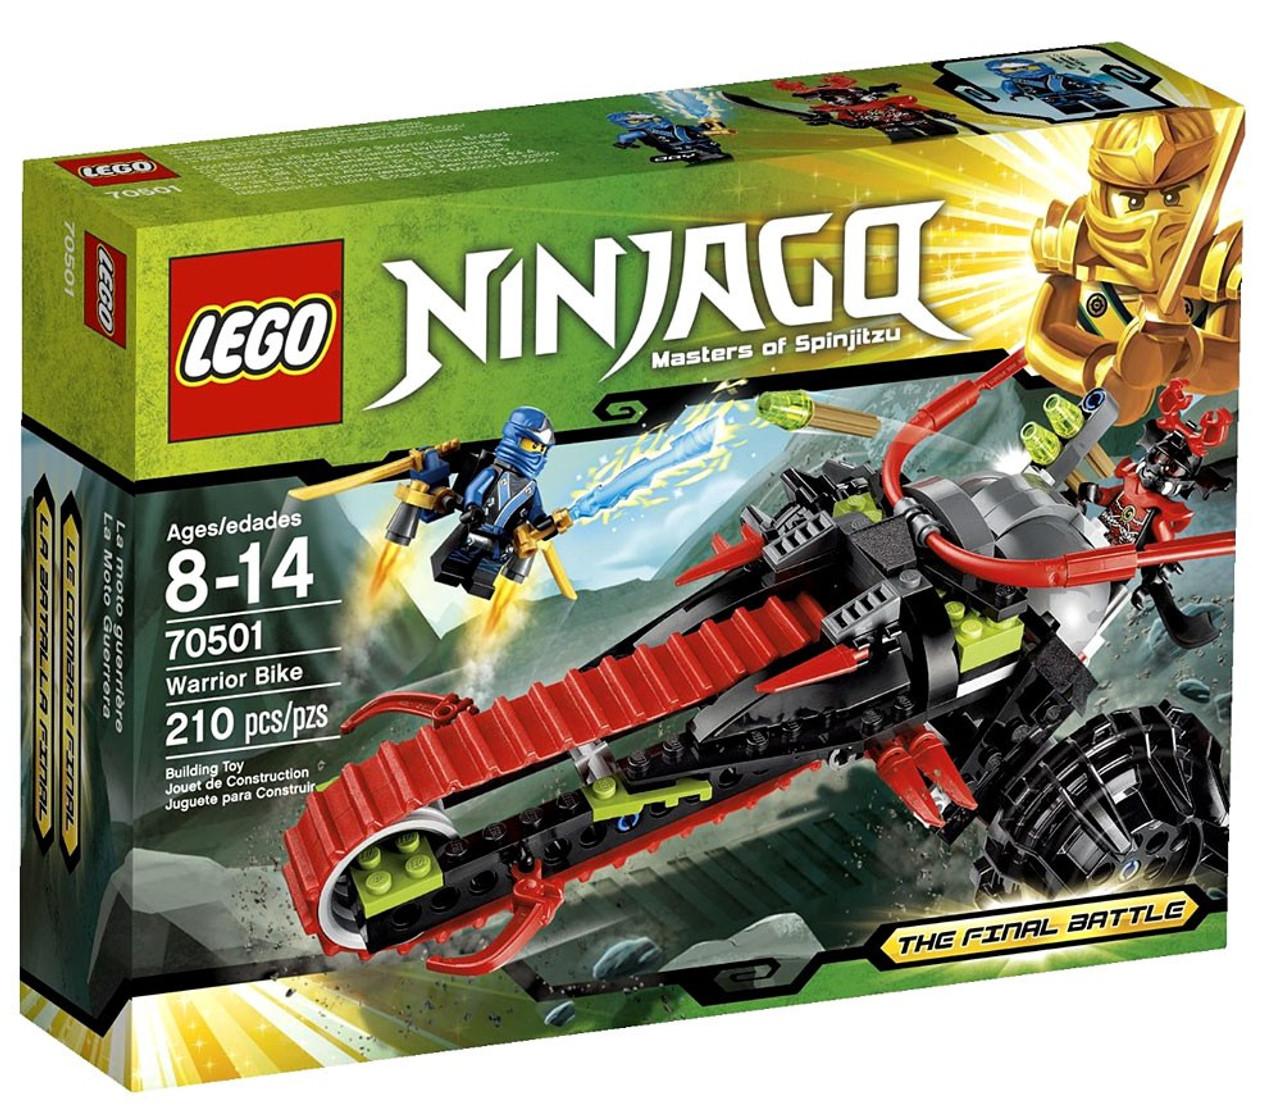 Lego Ninjago The Final Battle Warrior Bike Set 70501 Toywiz 70594 Lighthouse Siege